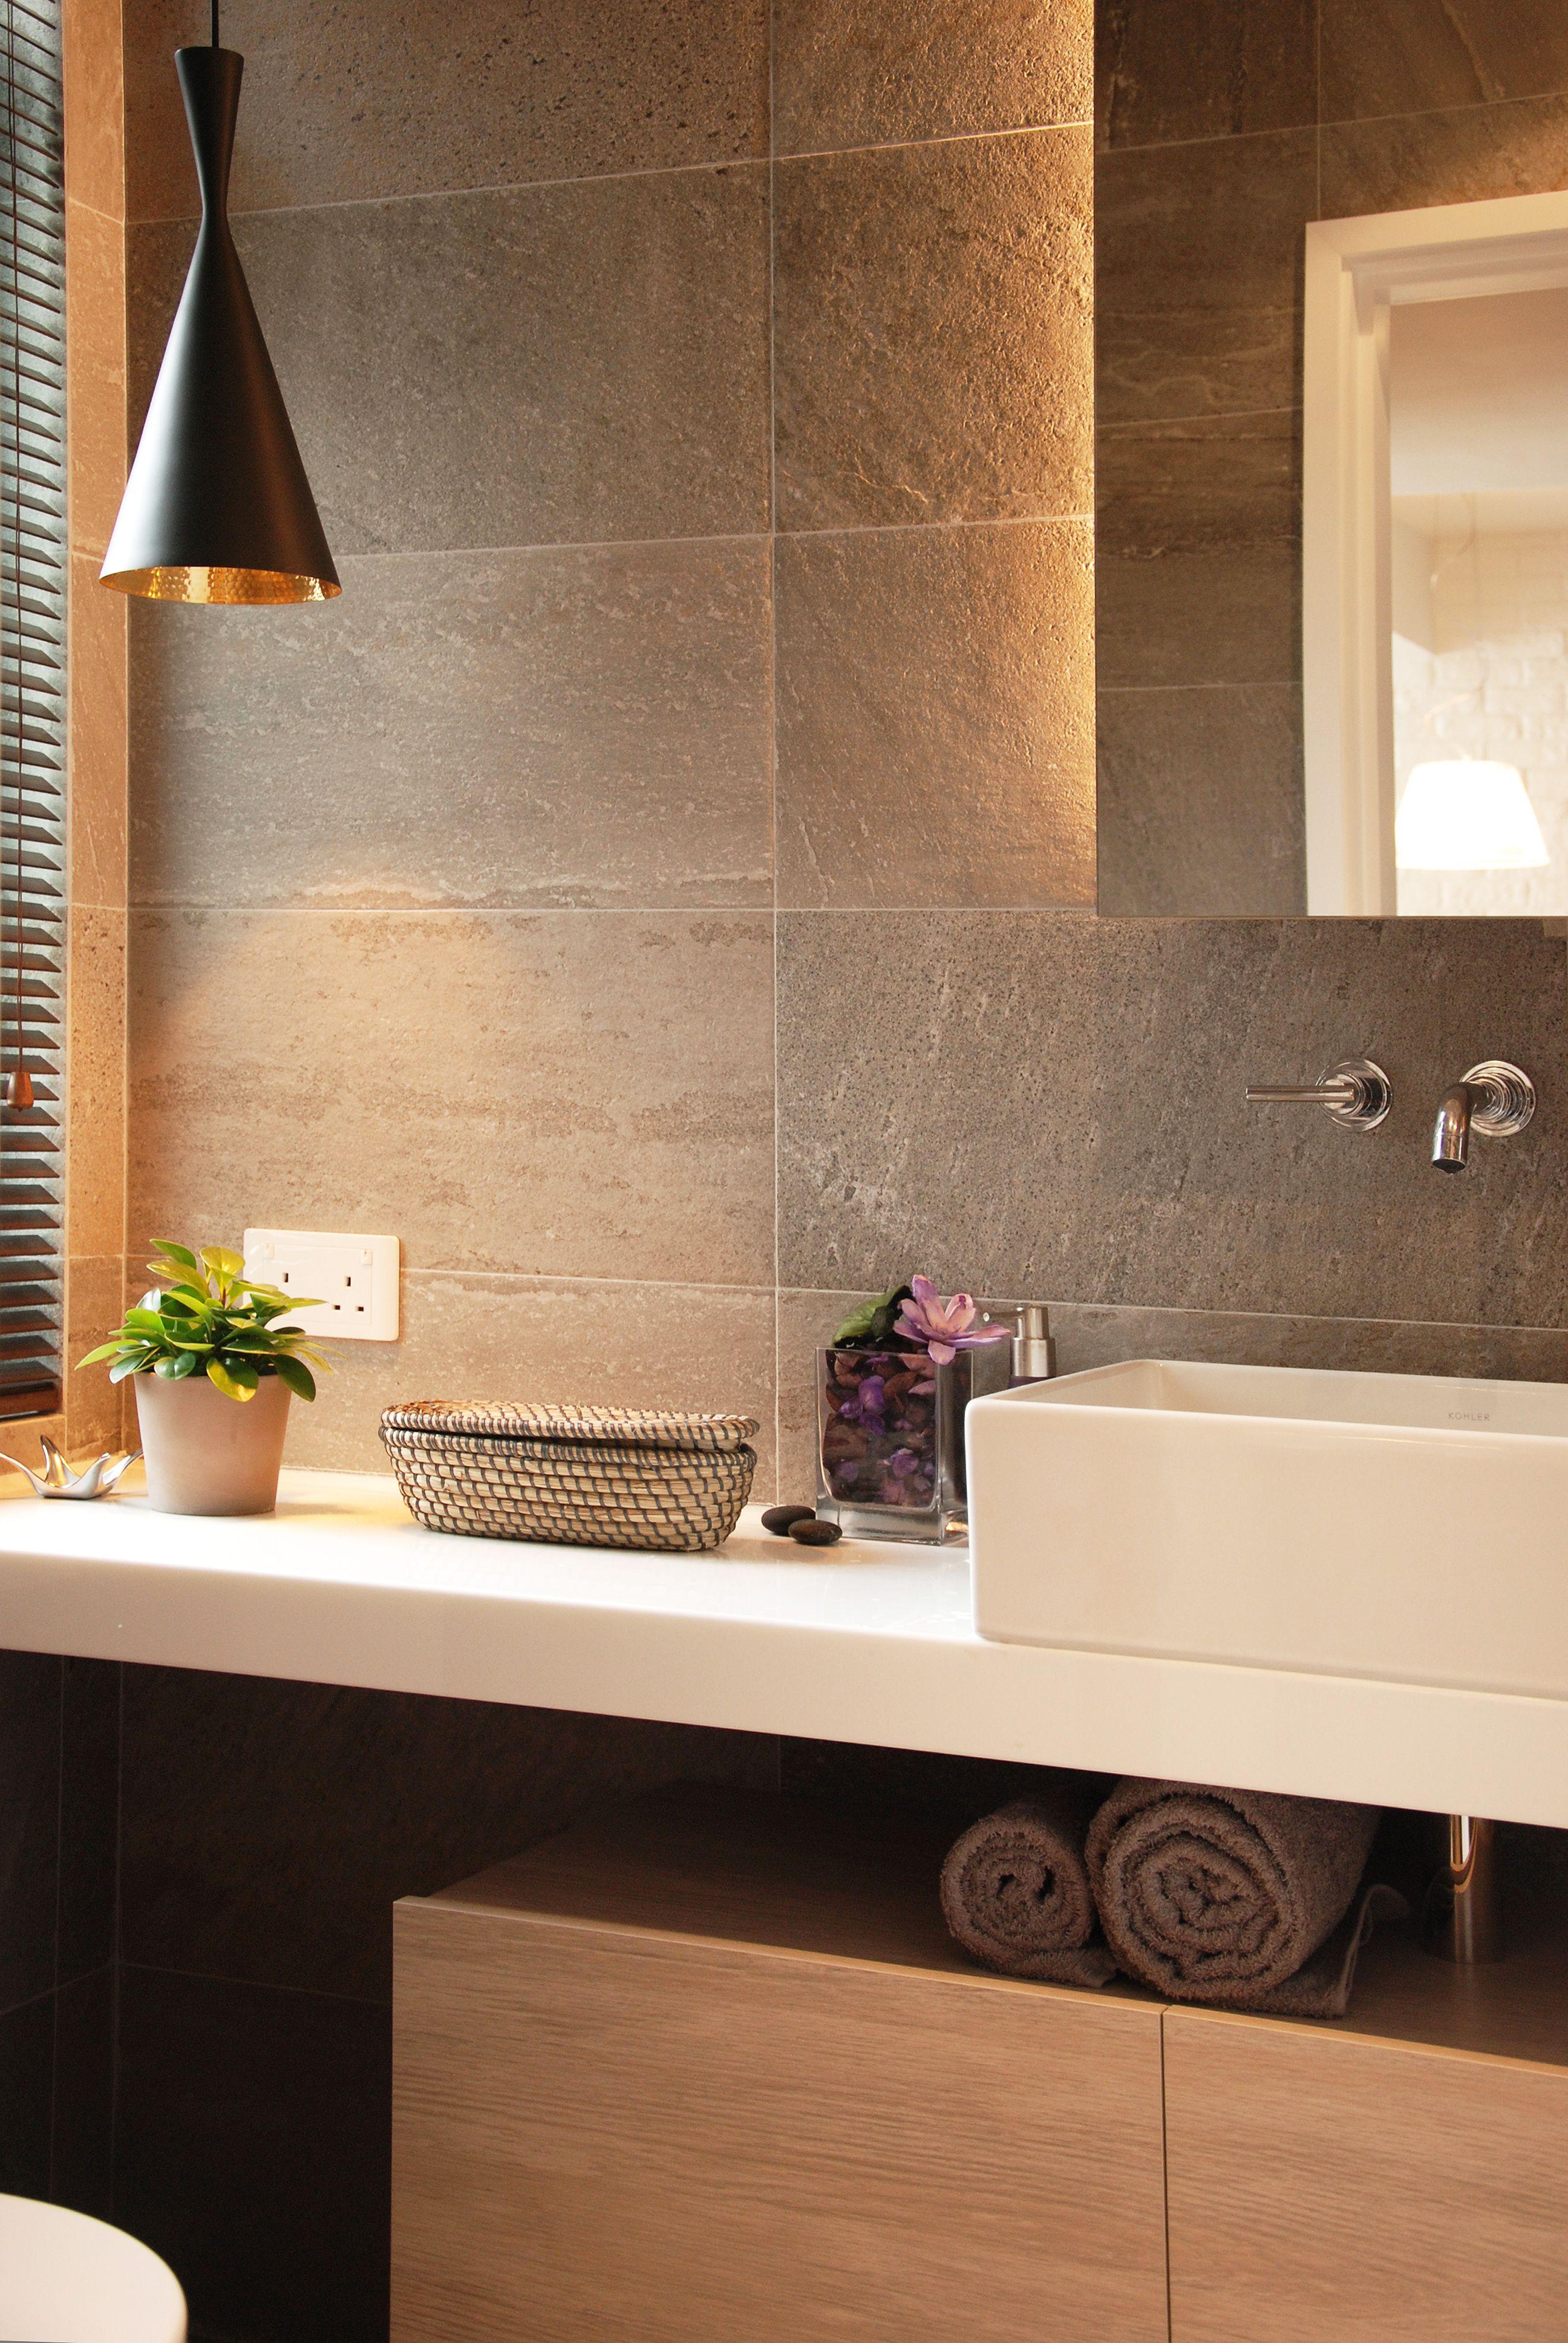 Waschtisch Farben Indirekte Beleuchtung Project Olivia By Hoo Www Hoo Residence Com Www Fac Grosse Fliesen Badezimmer Design Badezimmer Innenausstattung